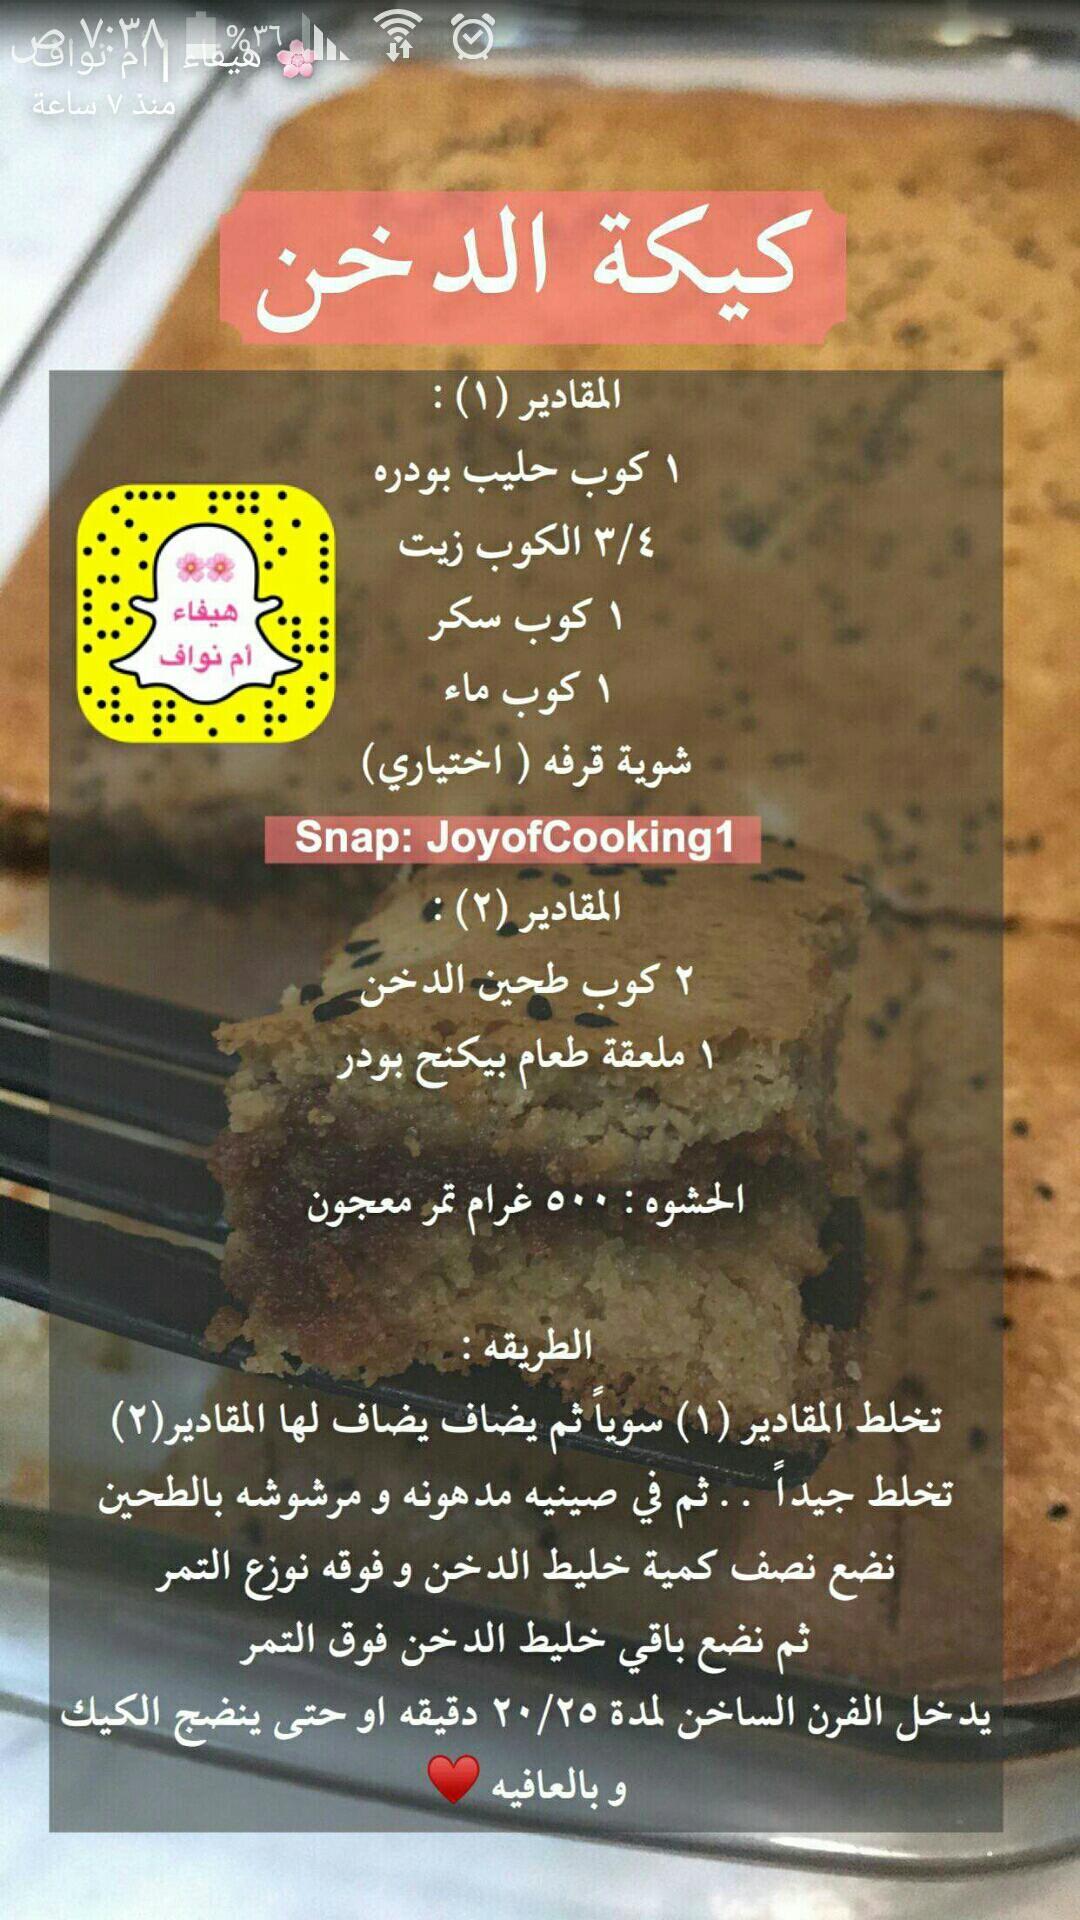 كيكه دخن Arabic Food Food Recipies Cooking Cake